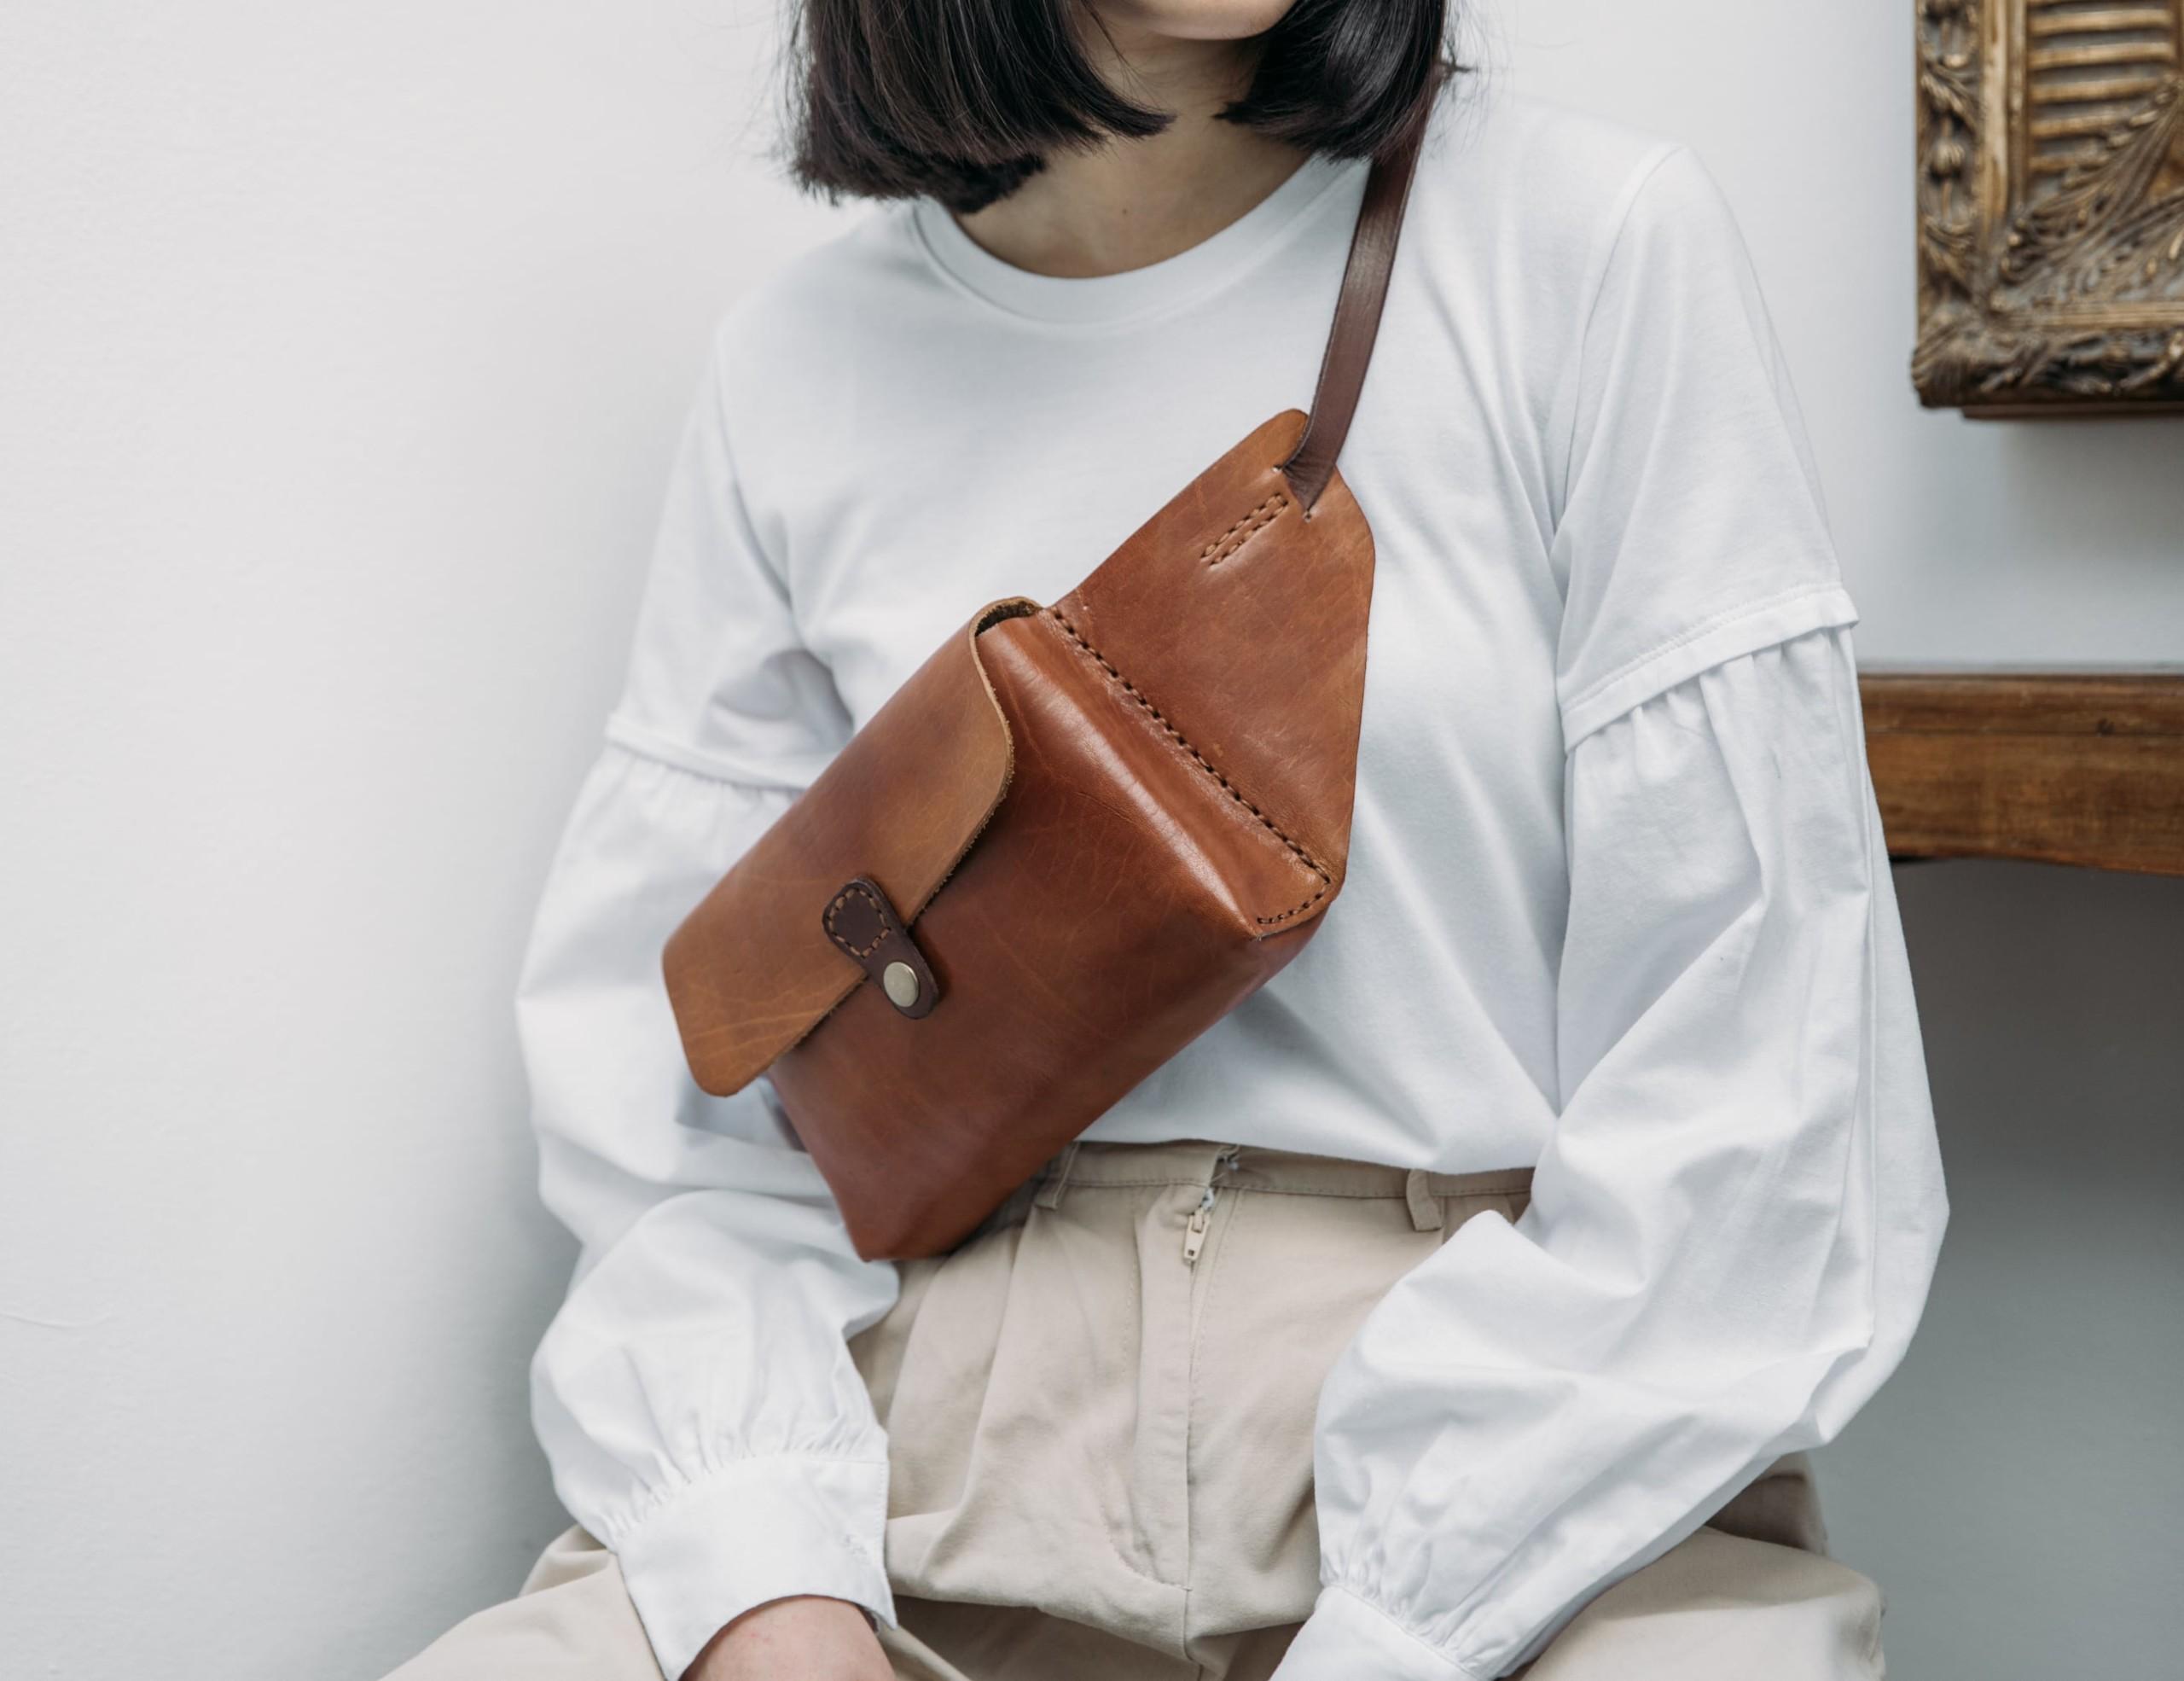 LindenLeatherCo Leather Belt Bag keeps your hands free